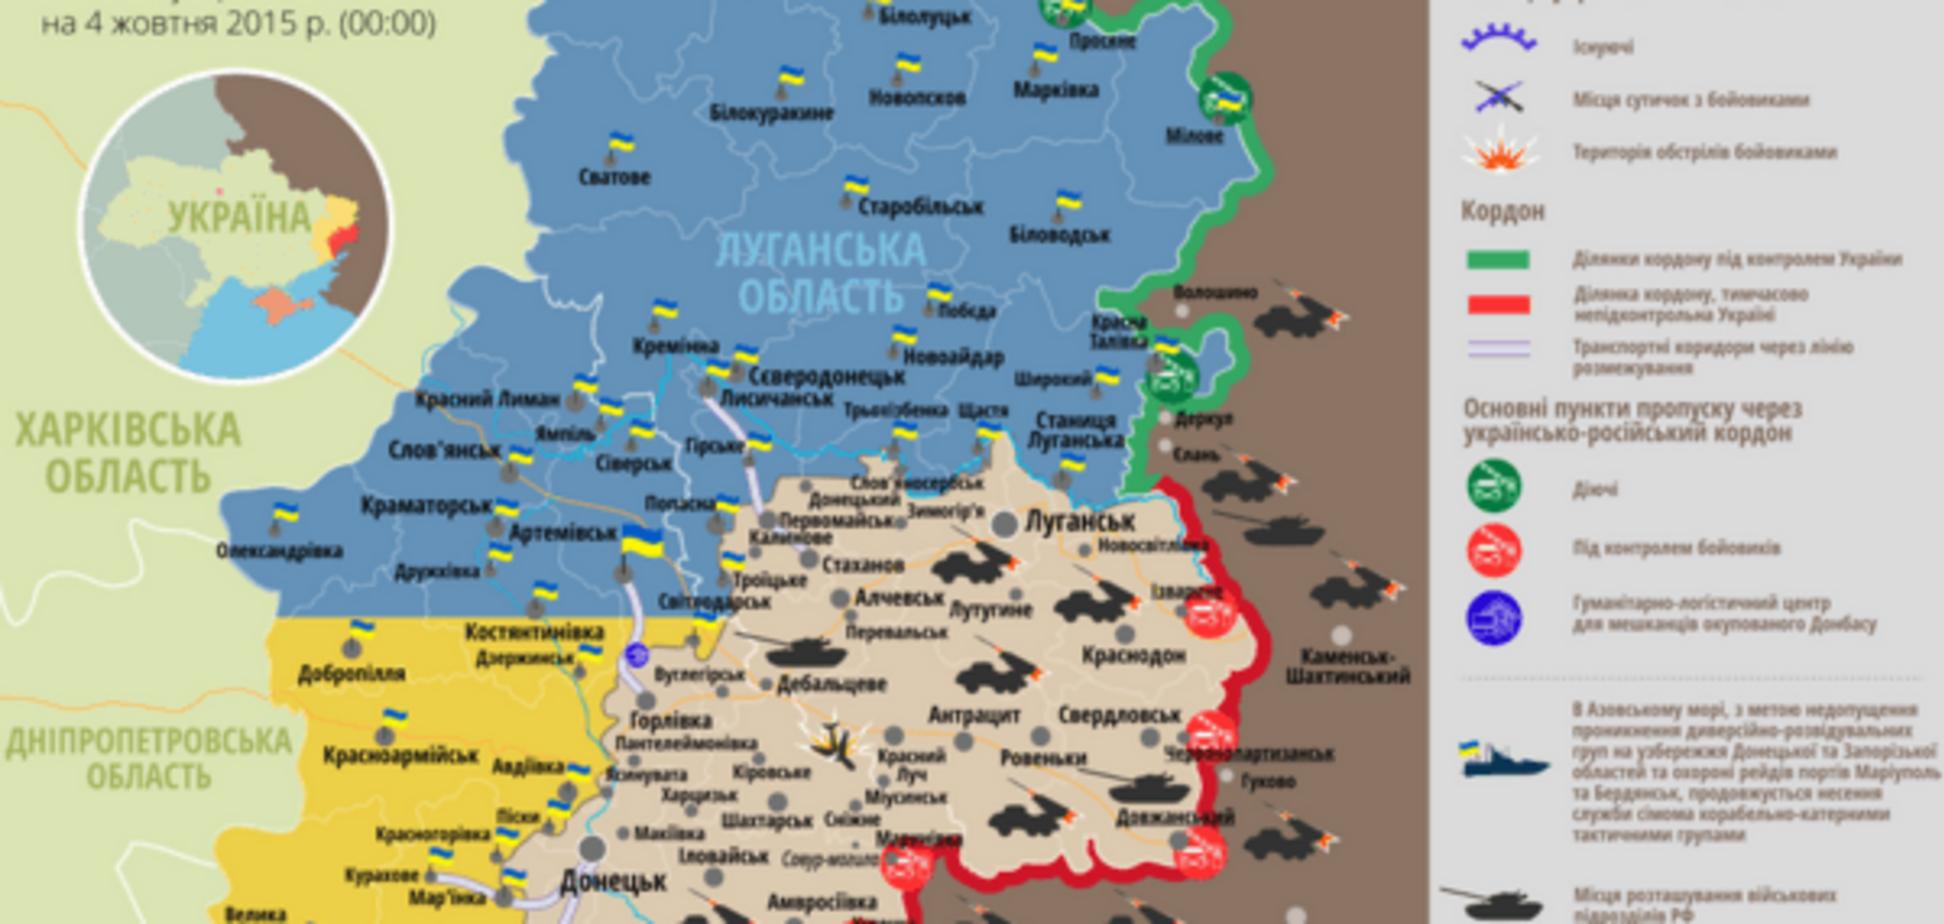 Опублікована актуальна карта АТО - 4 жовтня 2015